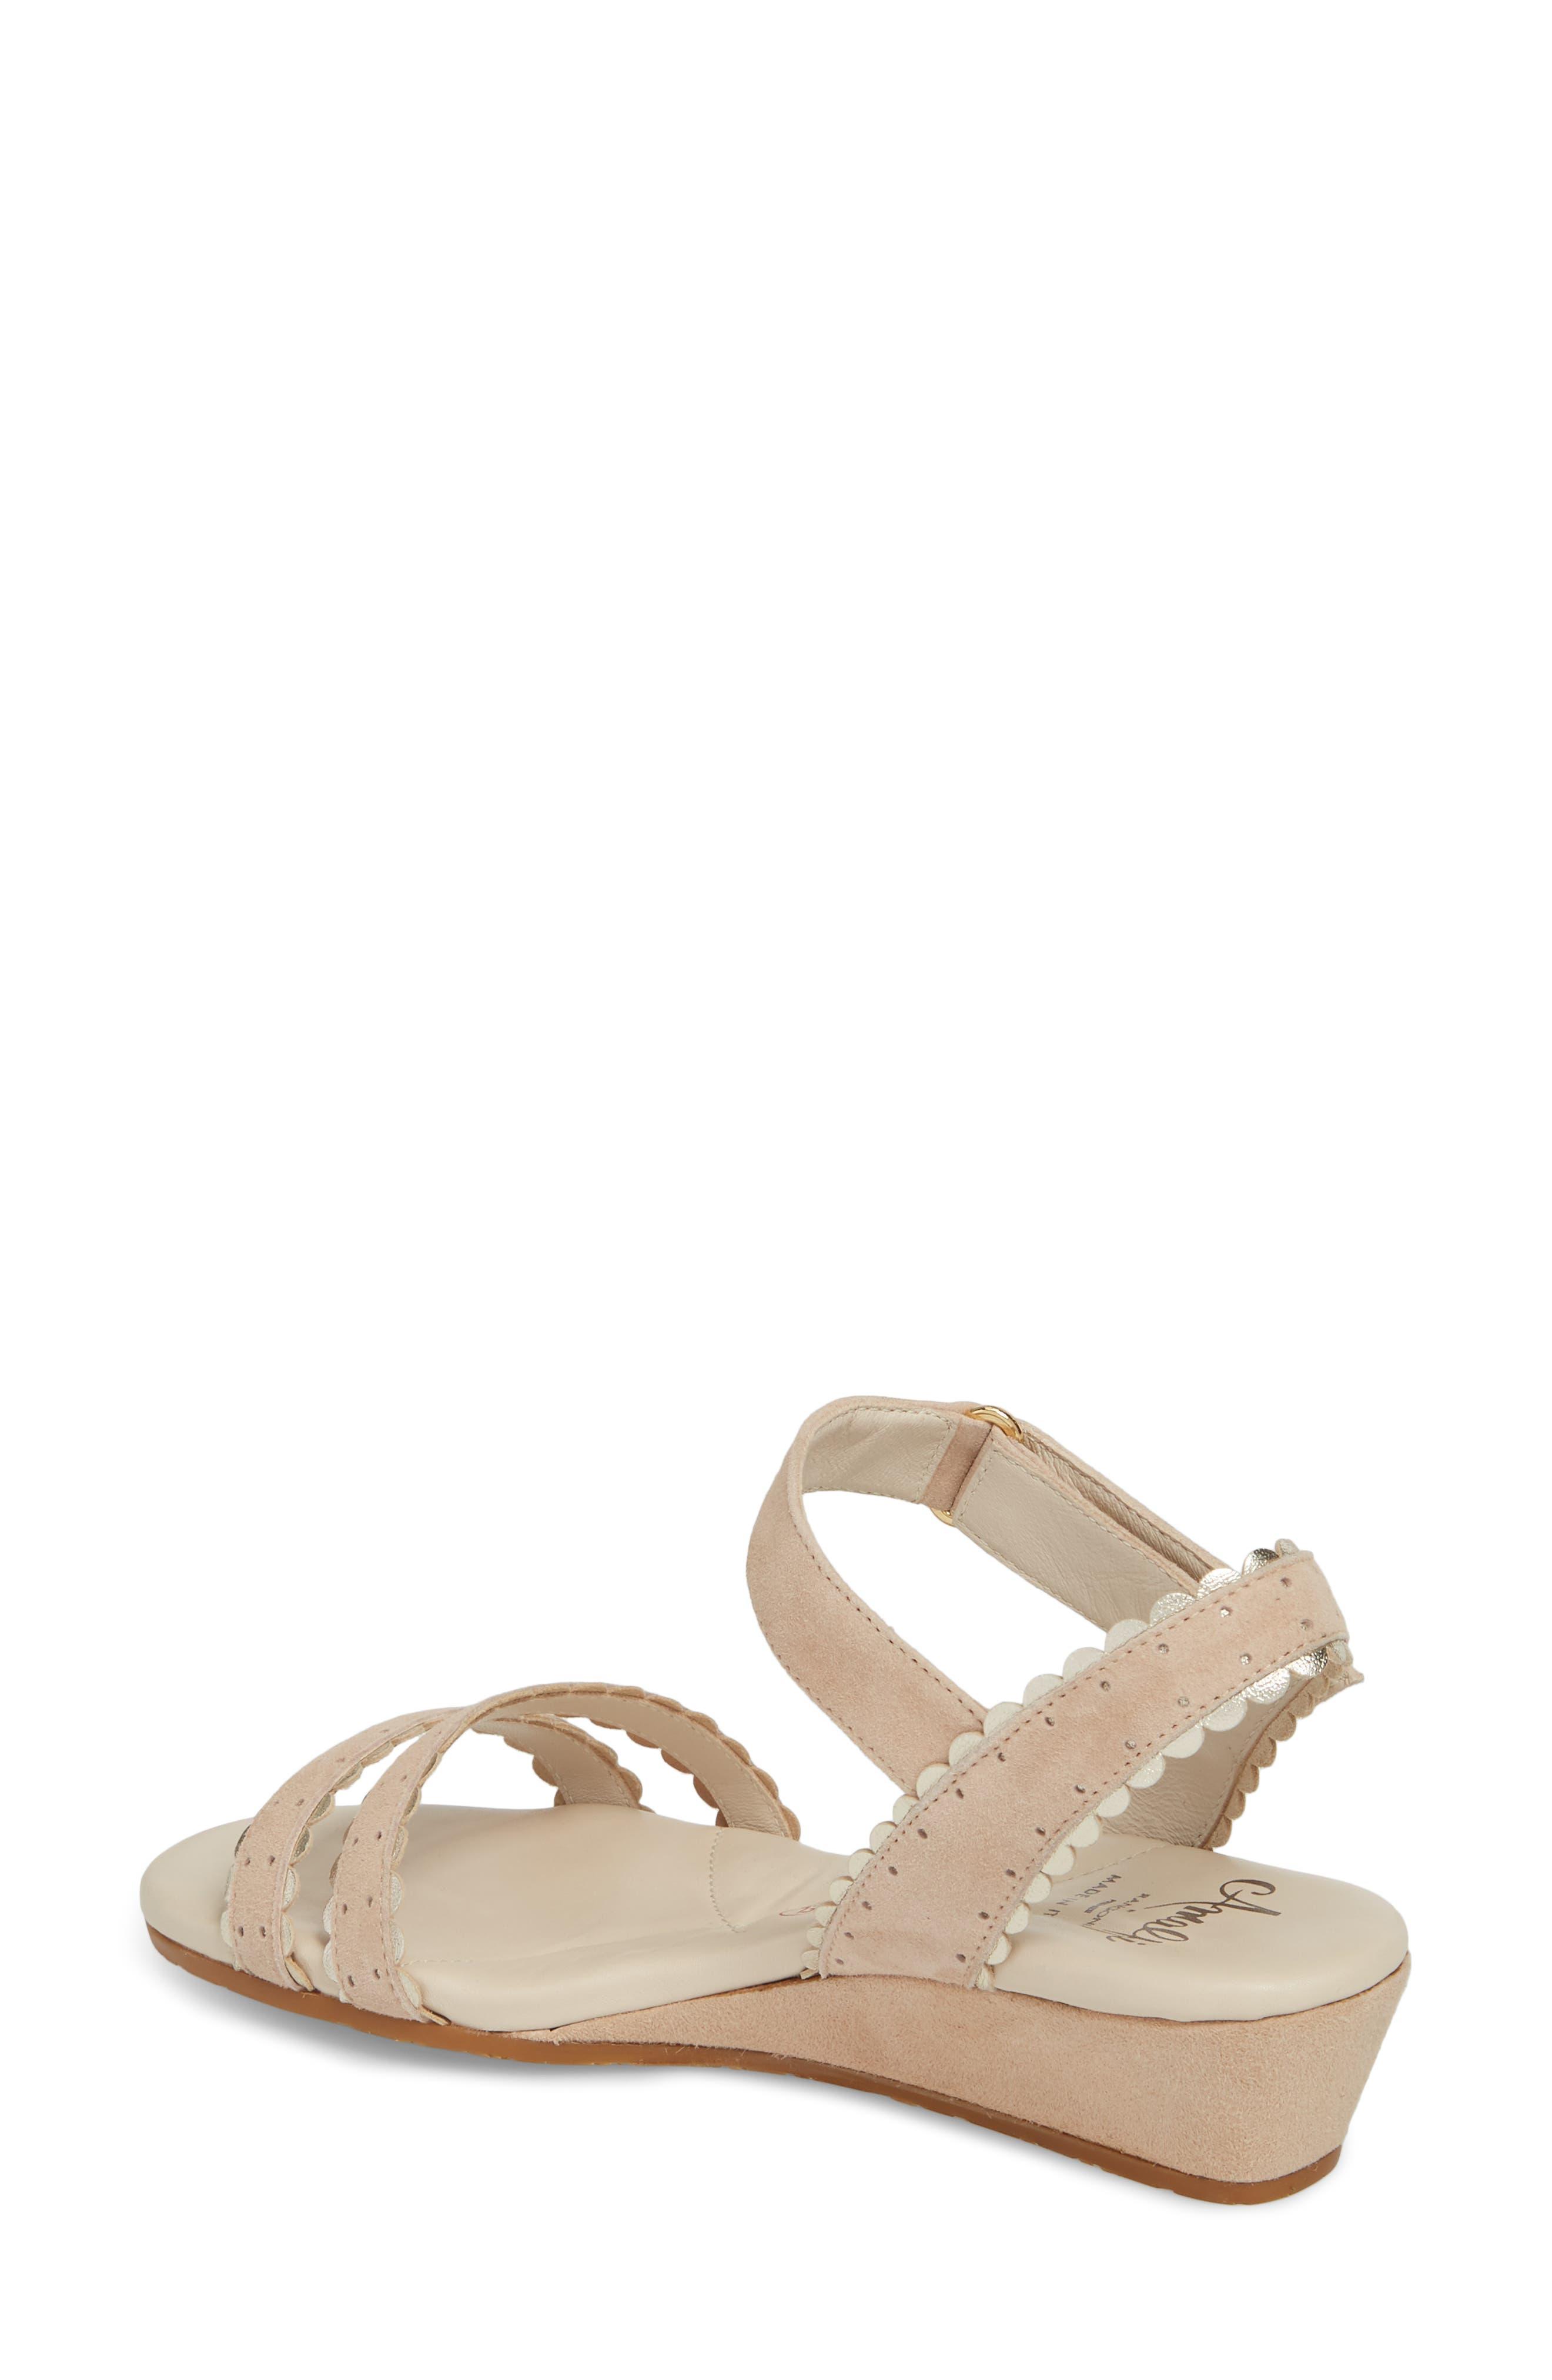 Messina Wedge Sandal,                             Alternate thumbnail 2, color,                             Cream/ Platinum Suede